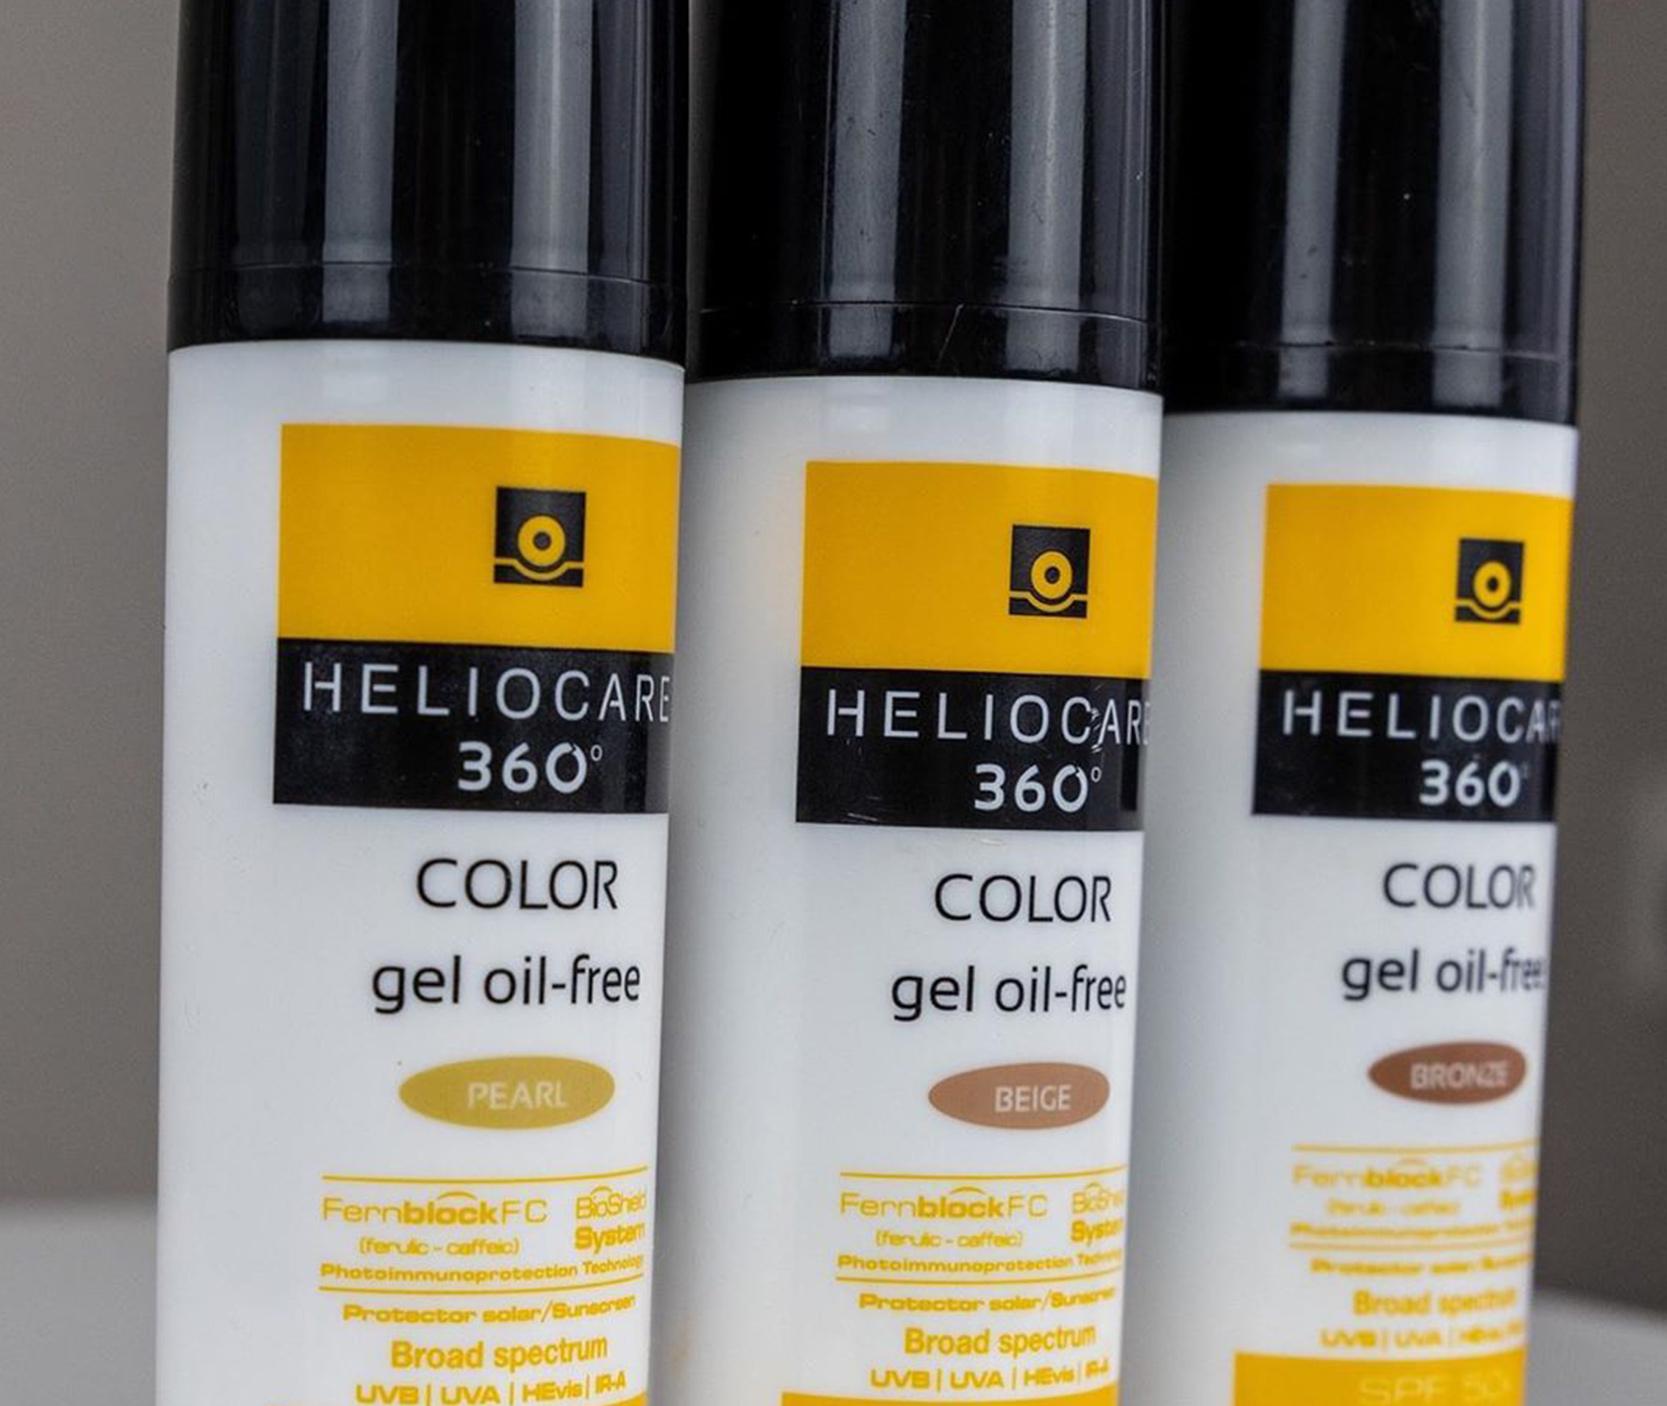 Heliocare 360: Color Gel Oil-Free SPF50+